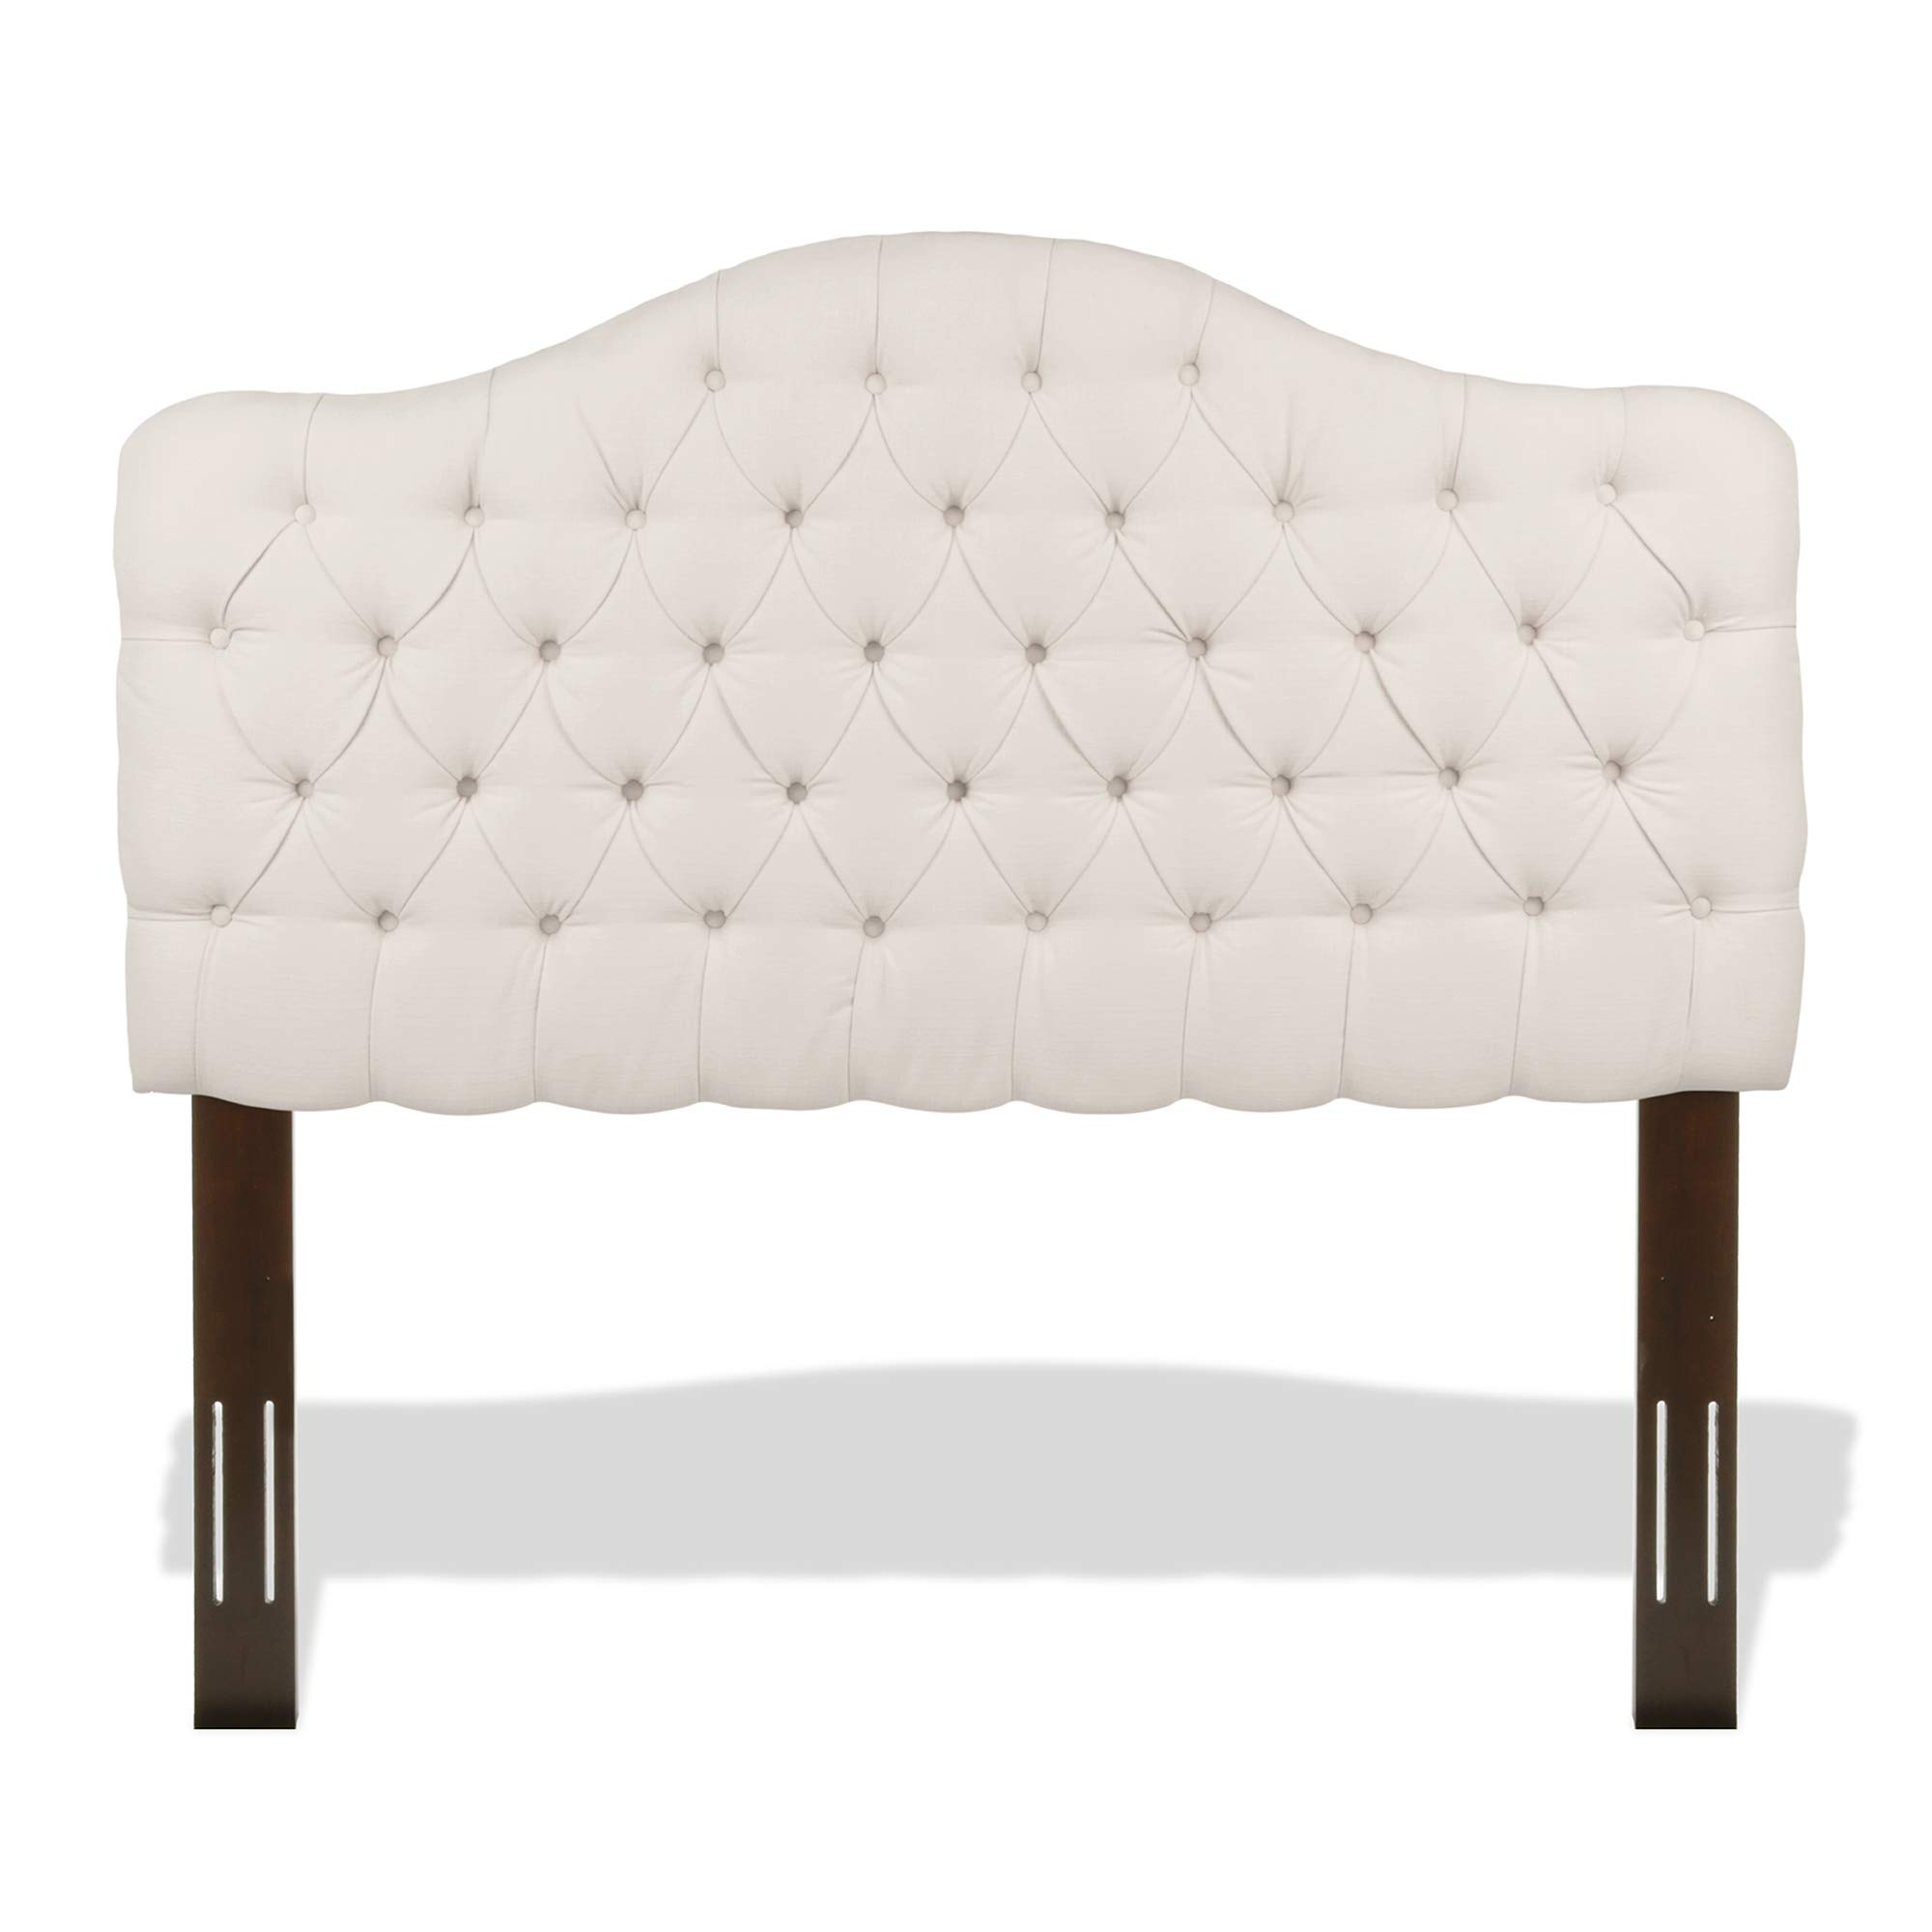 Leggett & Platt Martinique Button-Tuft Upholstered Headboard with Adjustable Height, Ivory Finish, Full / Queen